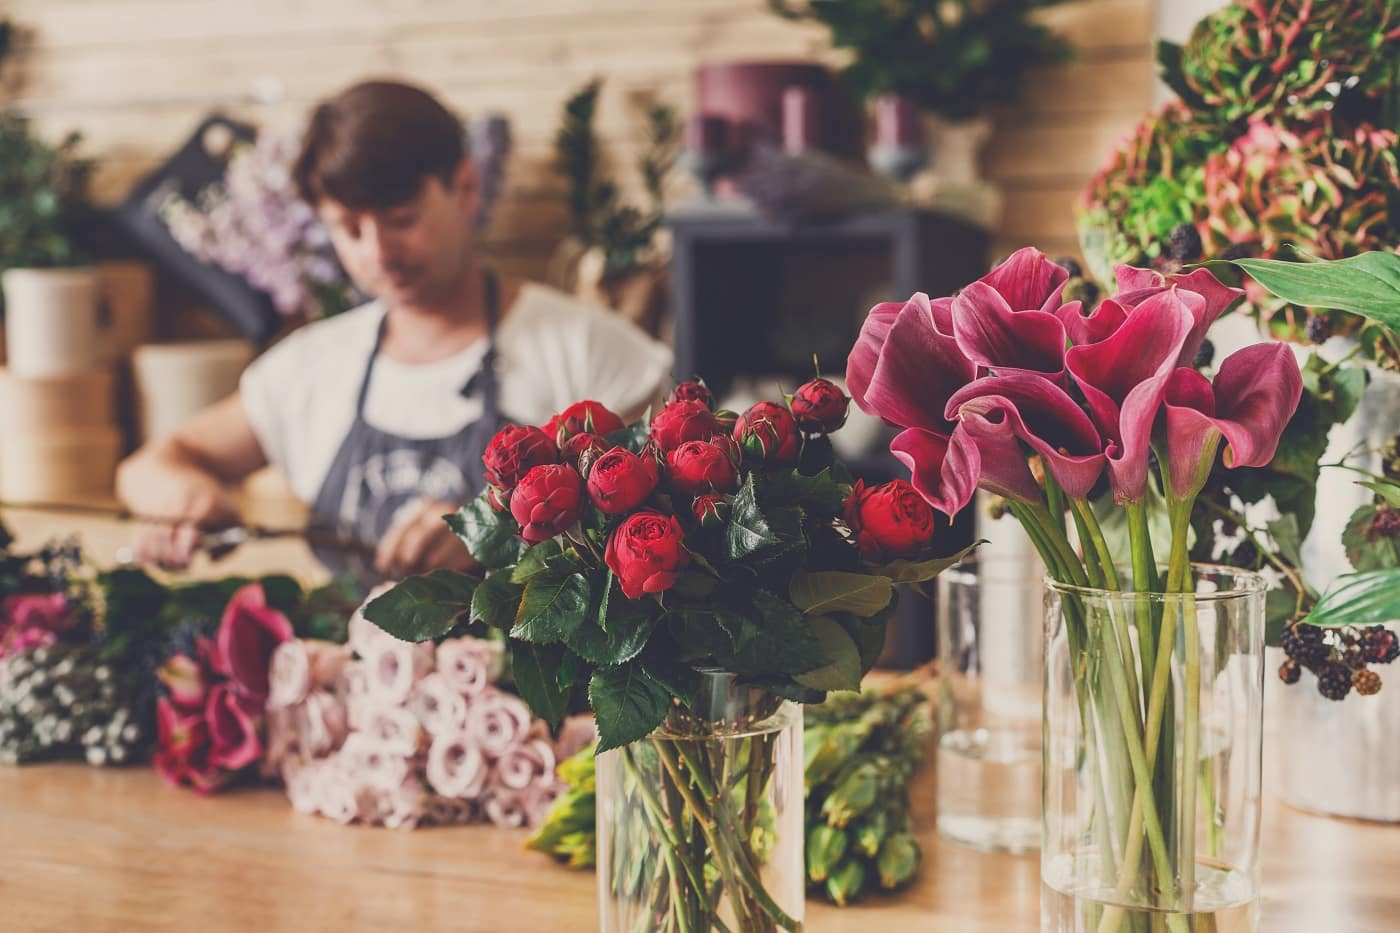 Florist near Danvers